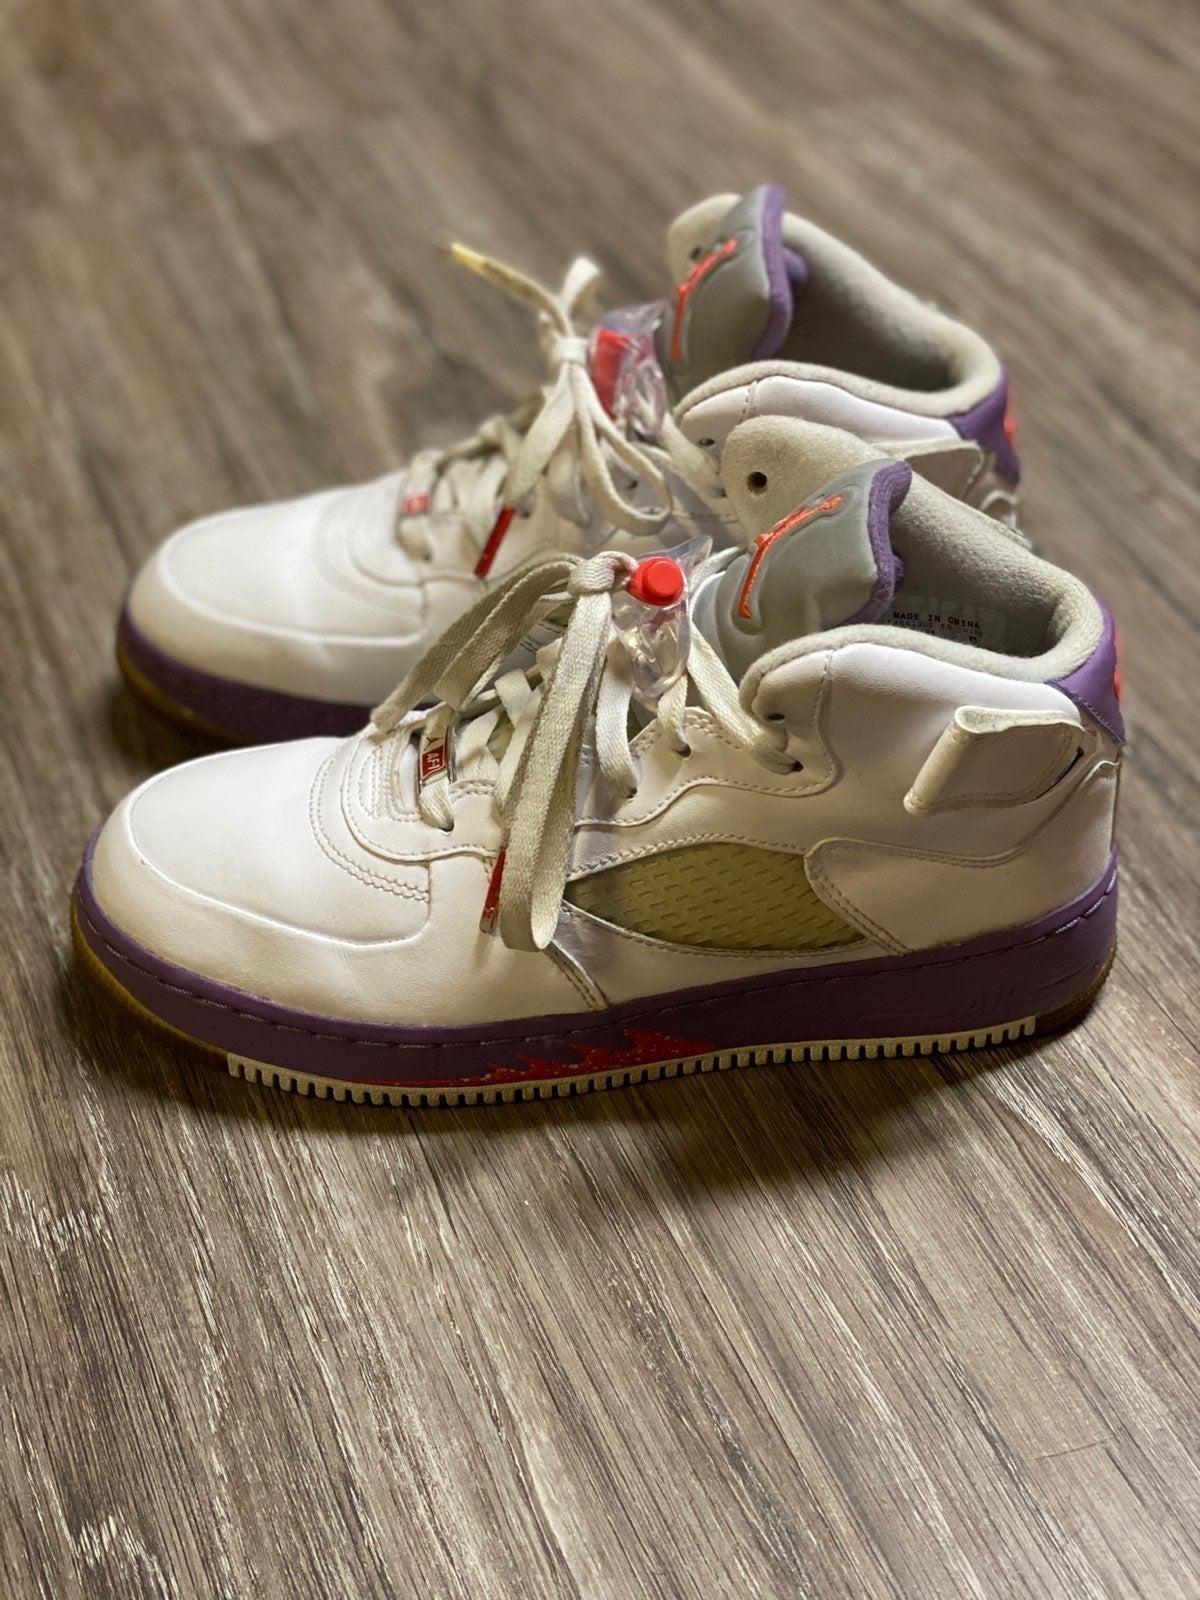 Jordan retro 5 Size: Youth 7